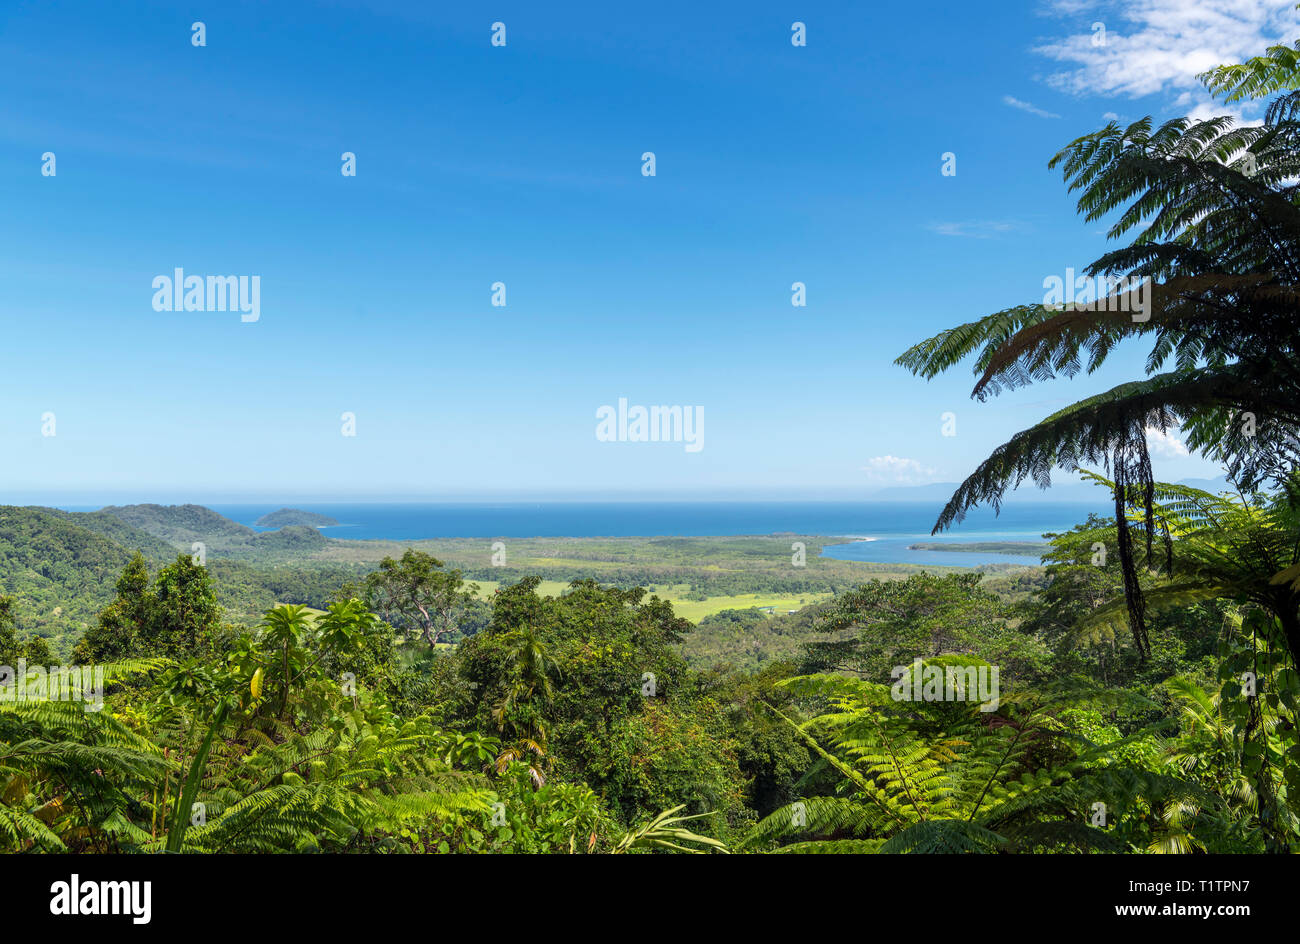 Daintree, Queensland. View from Mount Alexandra Lookout (Walu Wugirriga), Daintree Rainforest, Daintree National Park, Far North Queensland, Australia - Stock Image